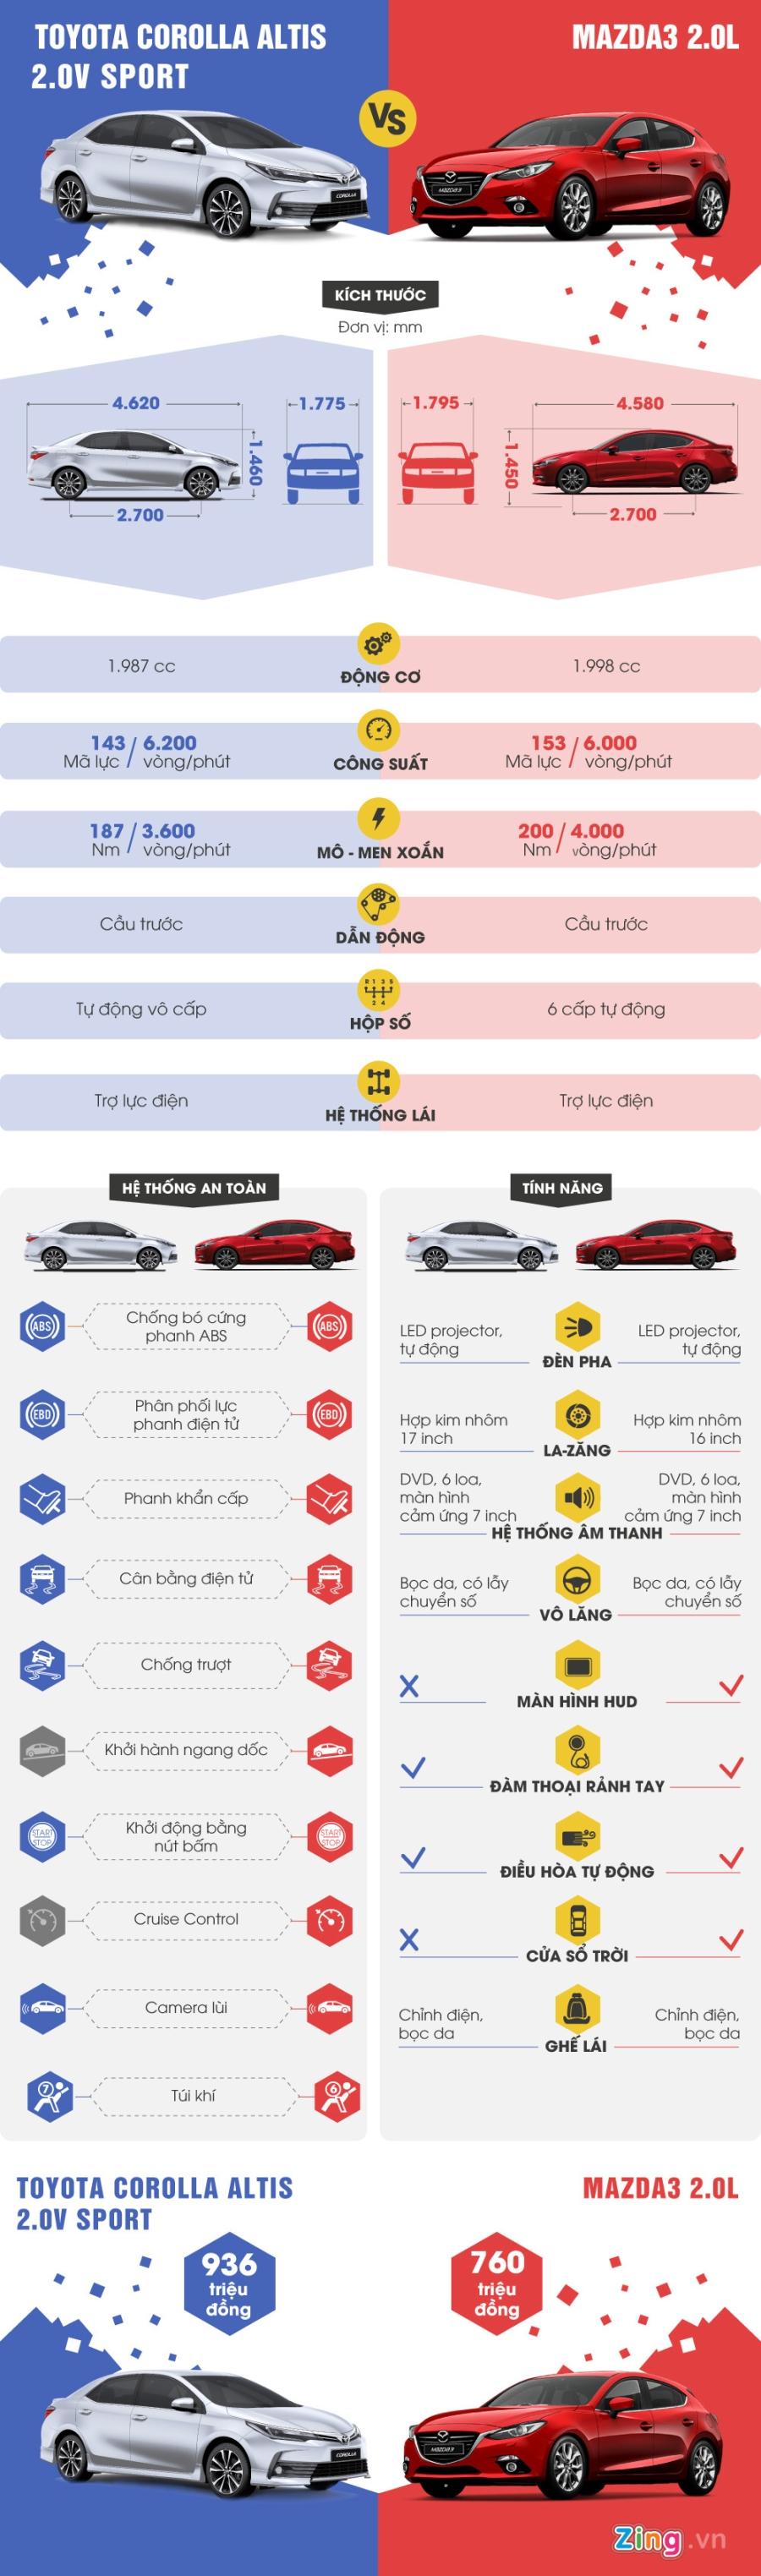 So sanh Toyota Corolla Altis 2017 va Mazda3 2017 hinh anh 1